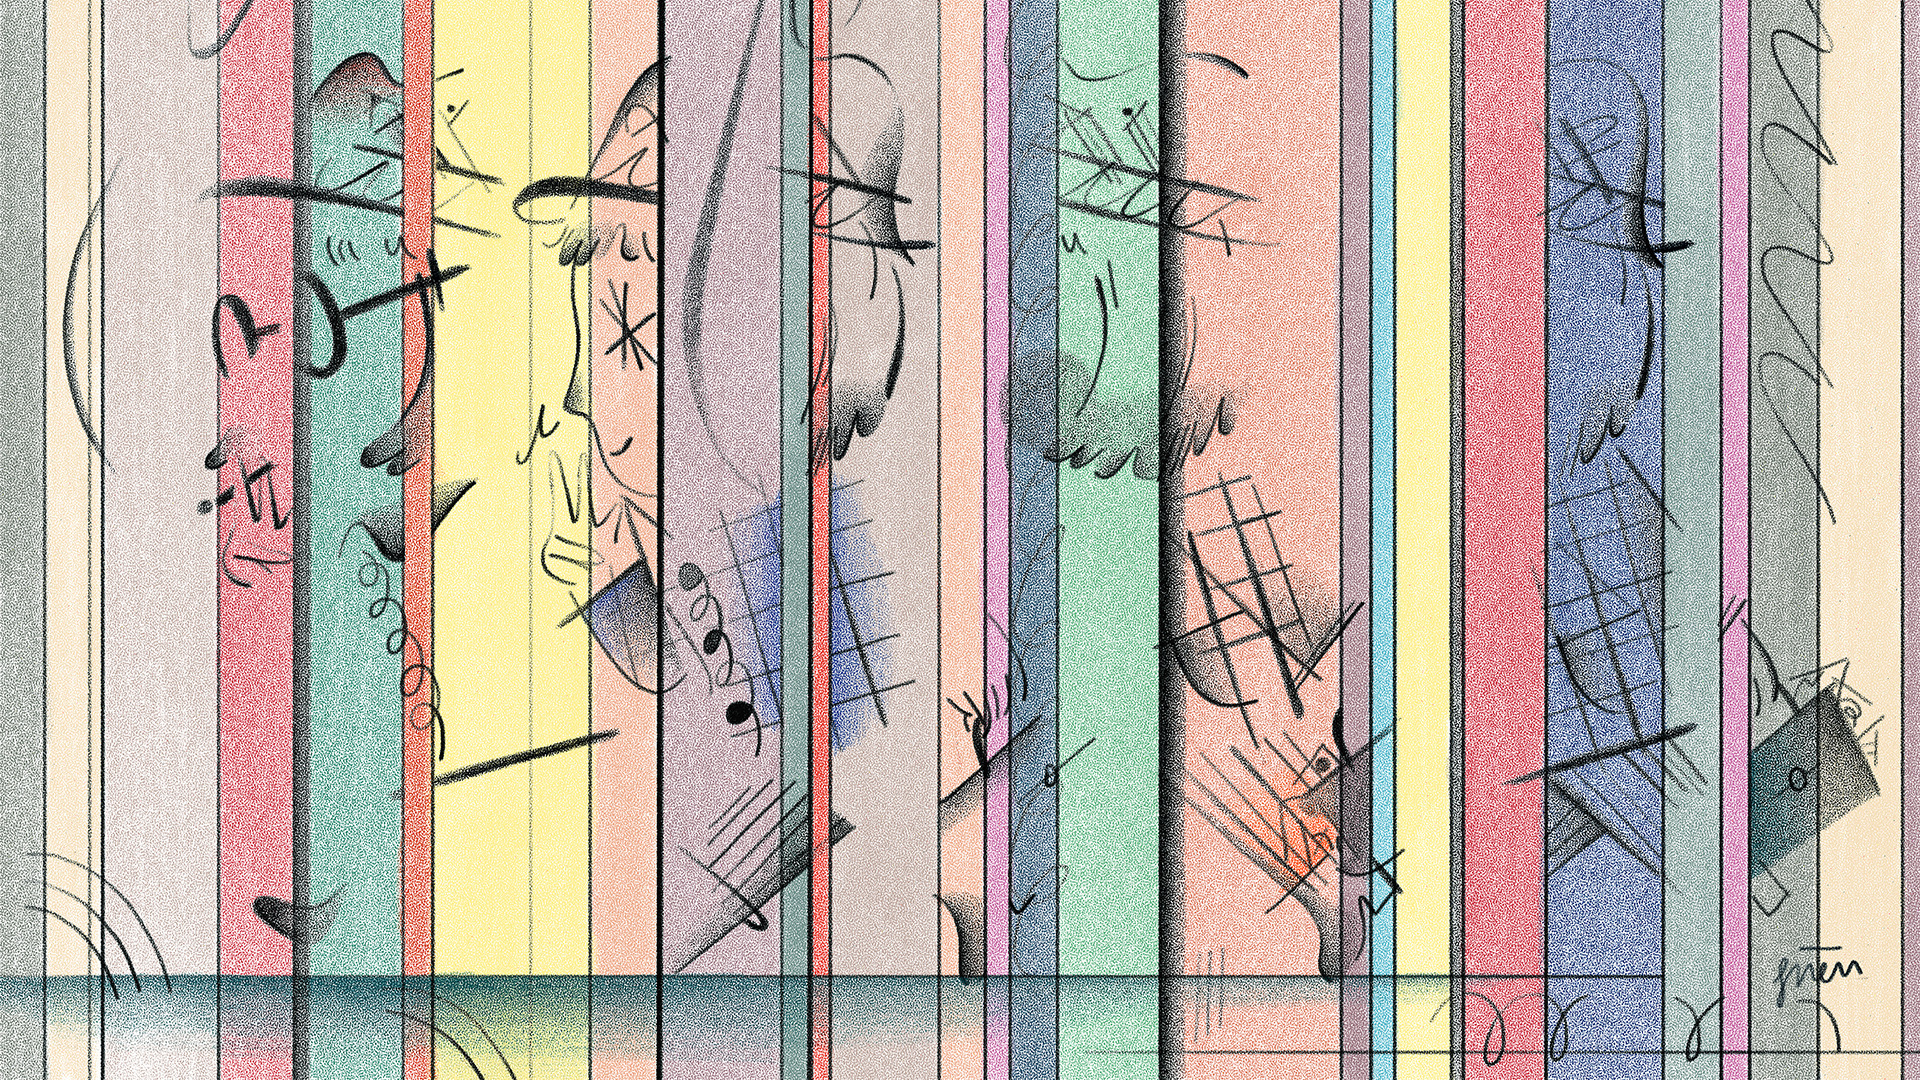 Graphic design by Gizem Vural